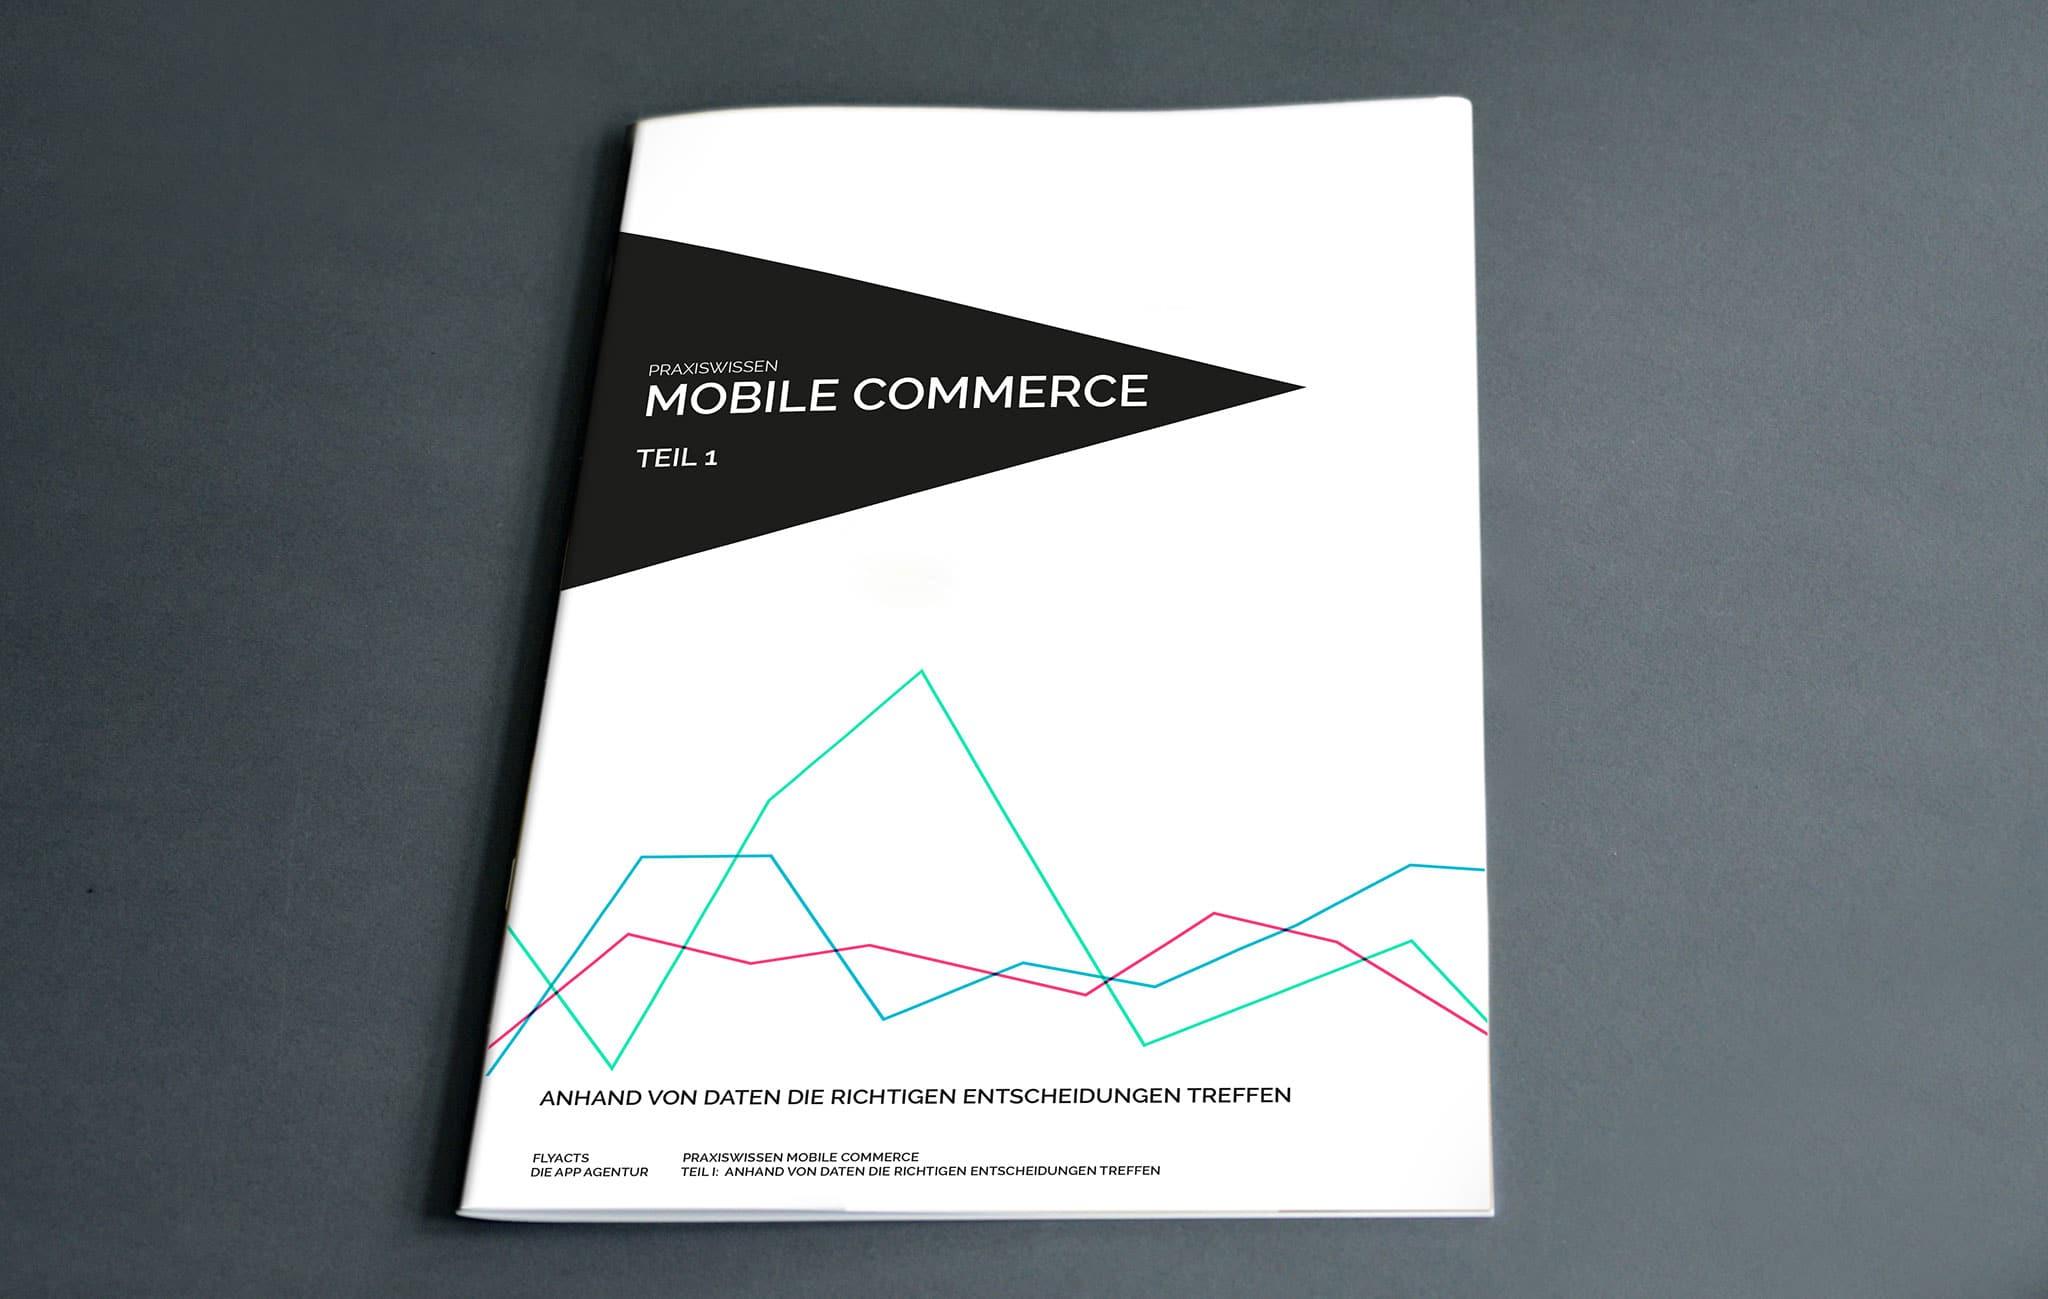 Praxiswissen Mobile Commerce Teil 1